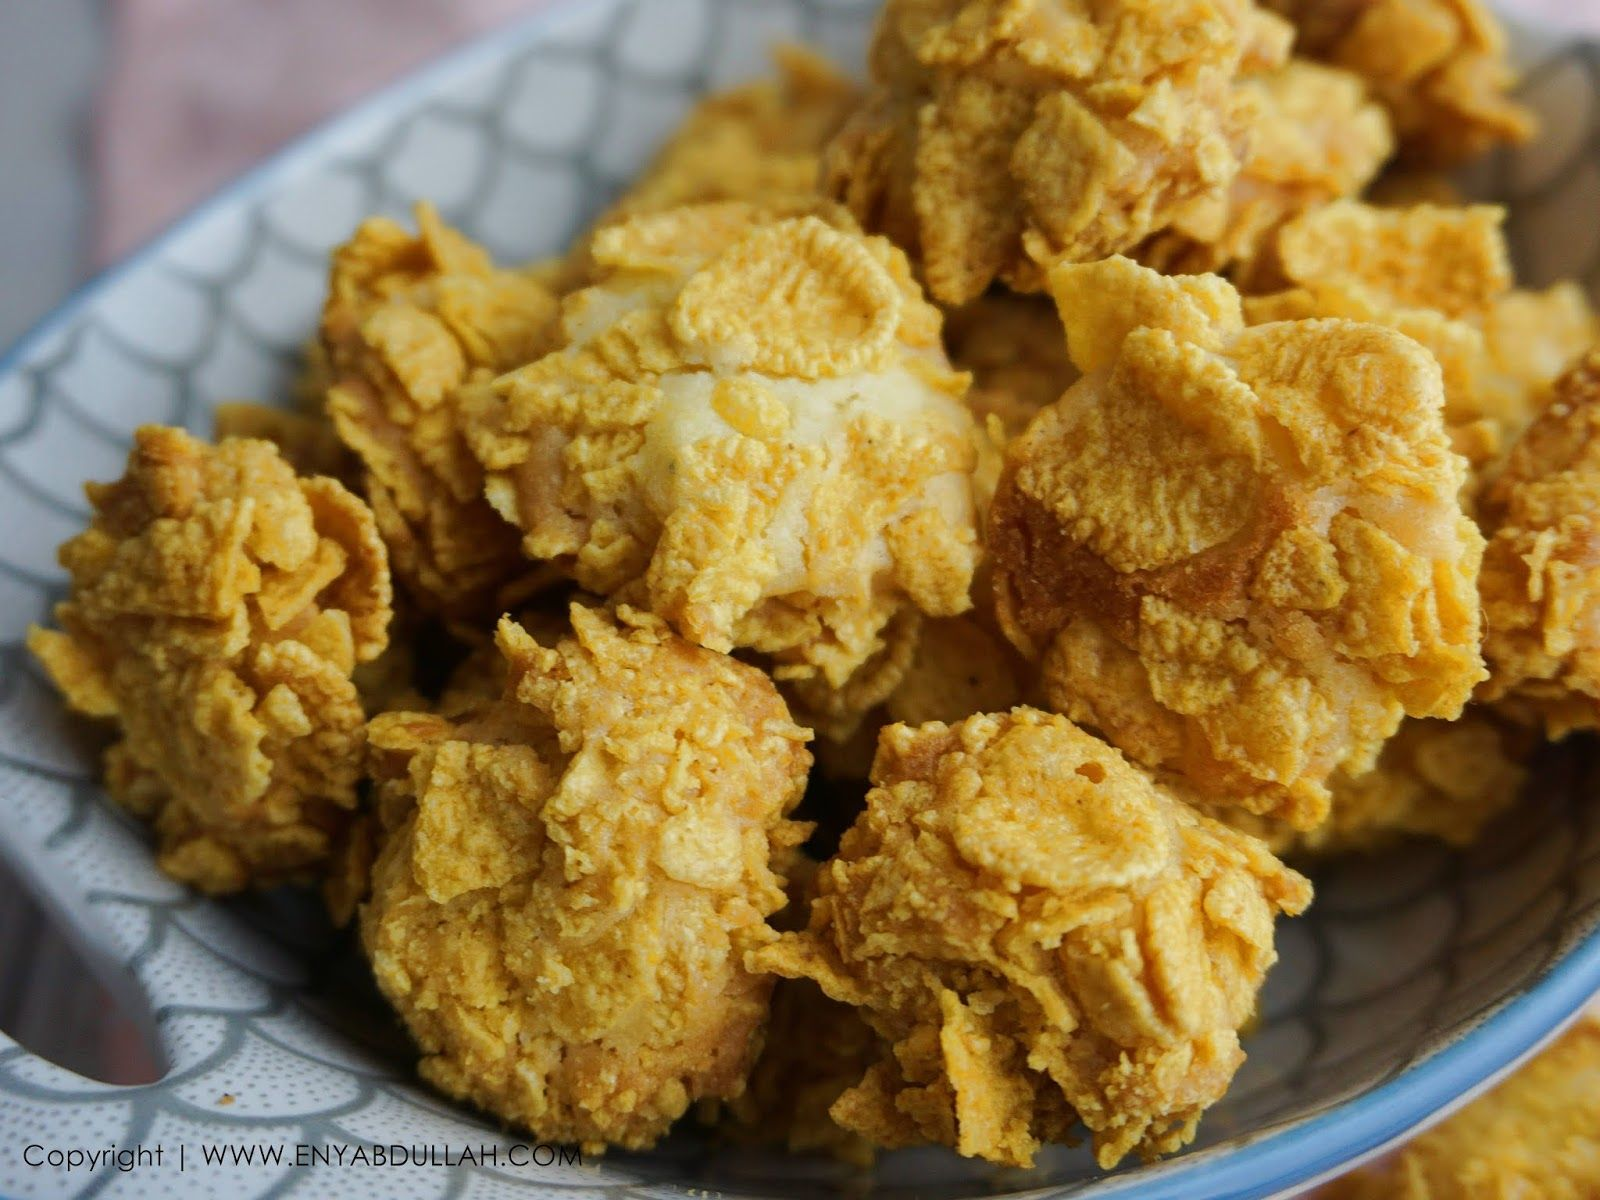 Biskut cornflakes, cornflakes ball, resepi kuih raya cornflakes, biskut cornflakes mudah, biskut